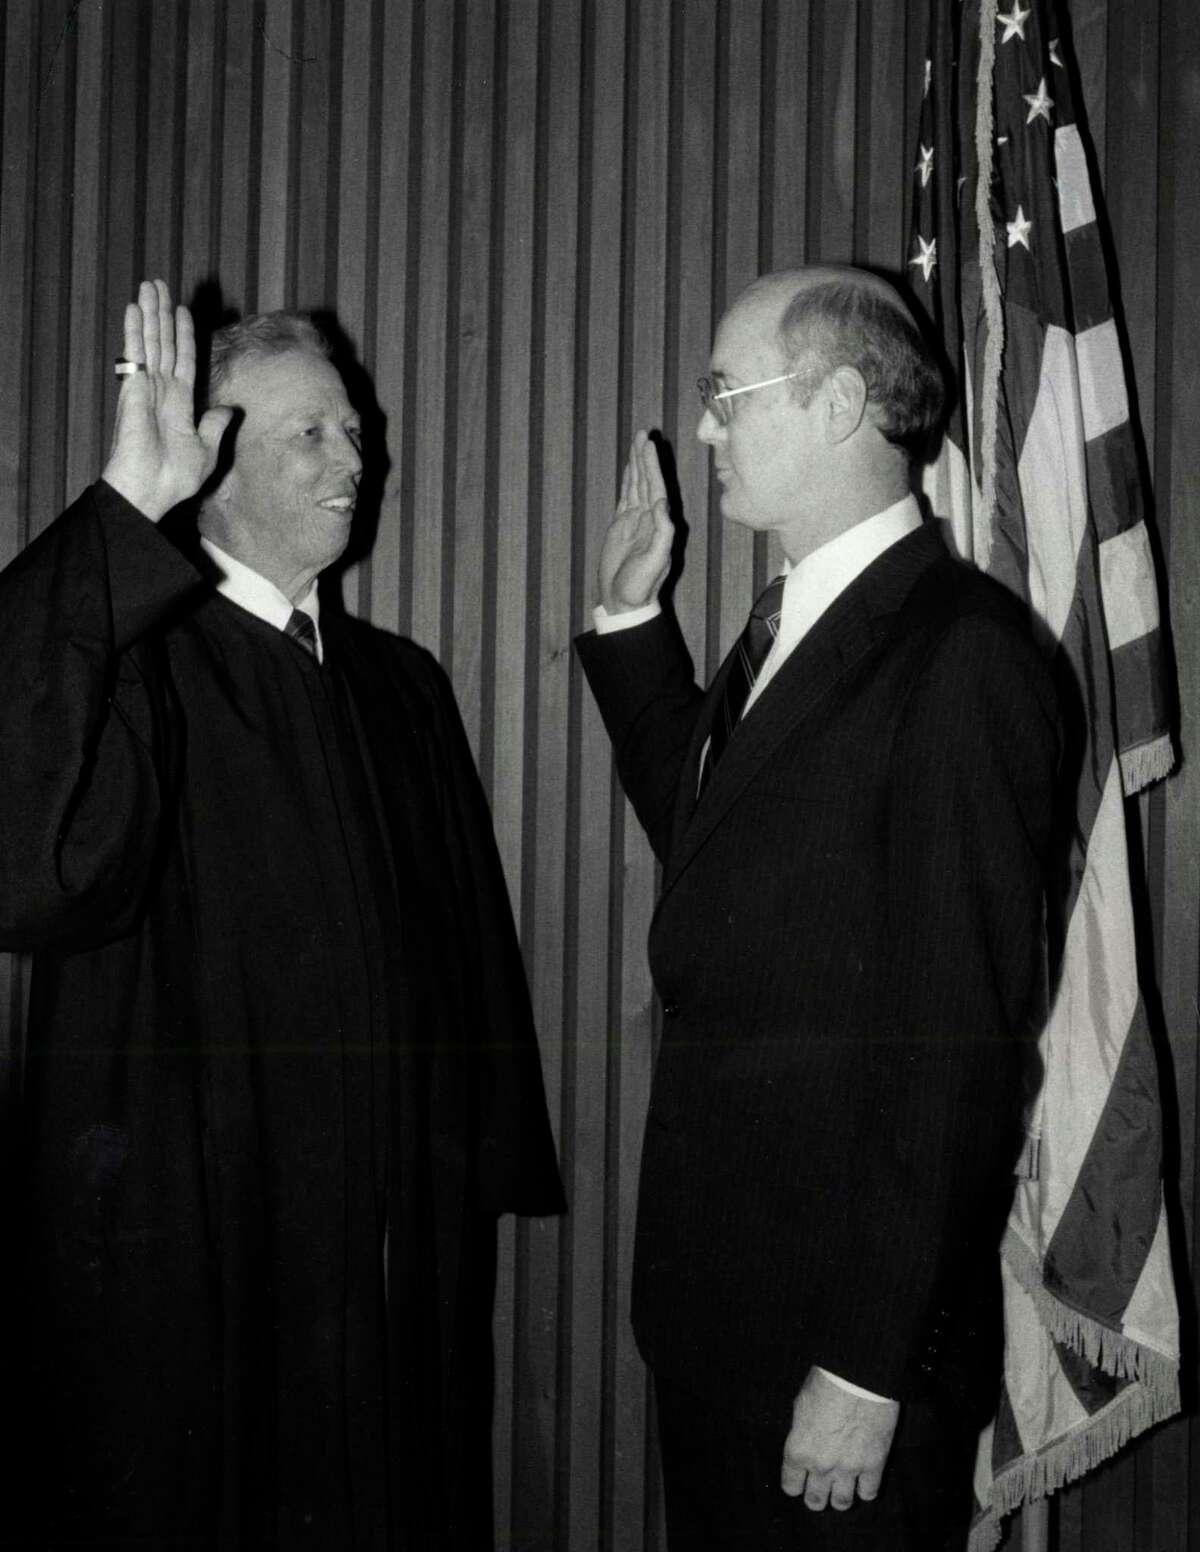 Former state District Judge Lynn N. Hughes, right, sworn in as a U.S. district judge by US District Judge John Singleton, left, Jan. 24, 1986.